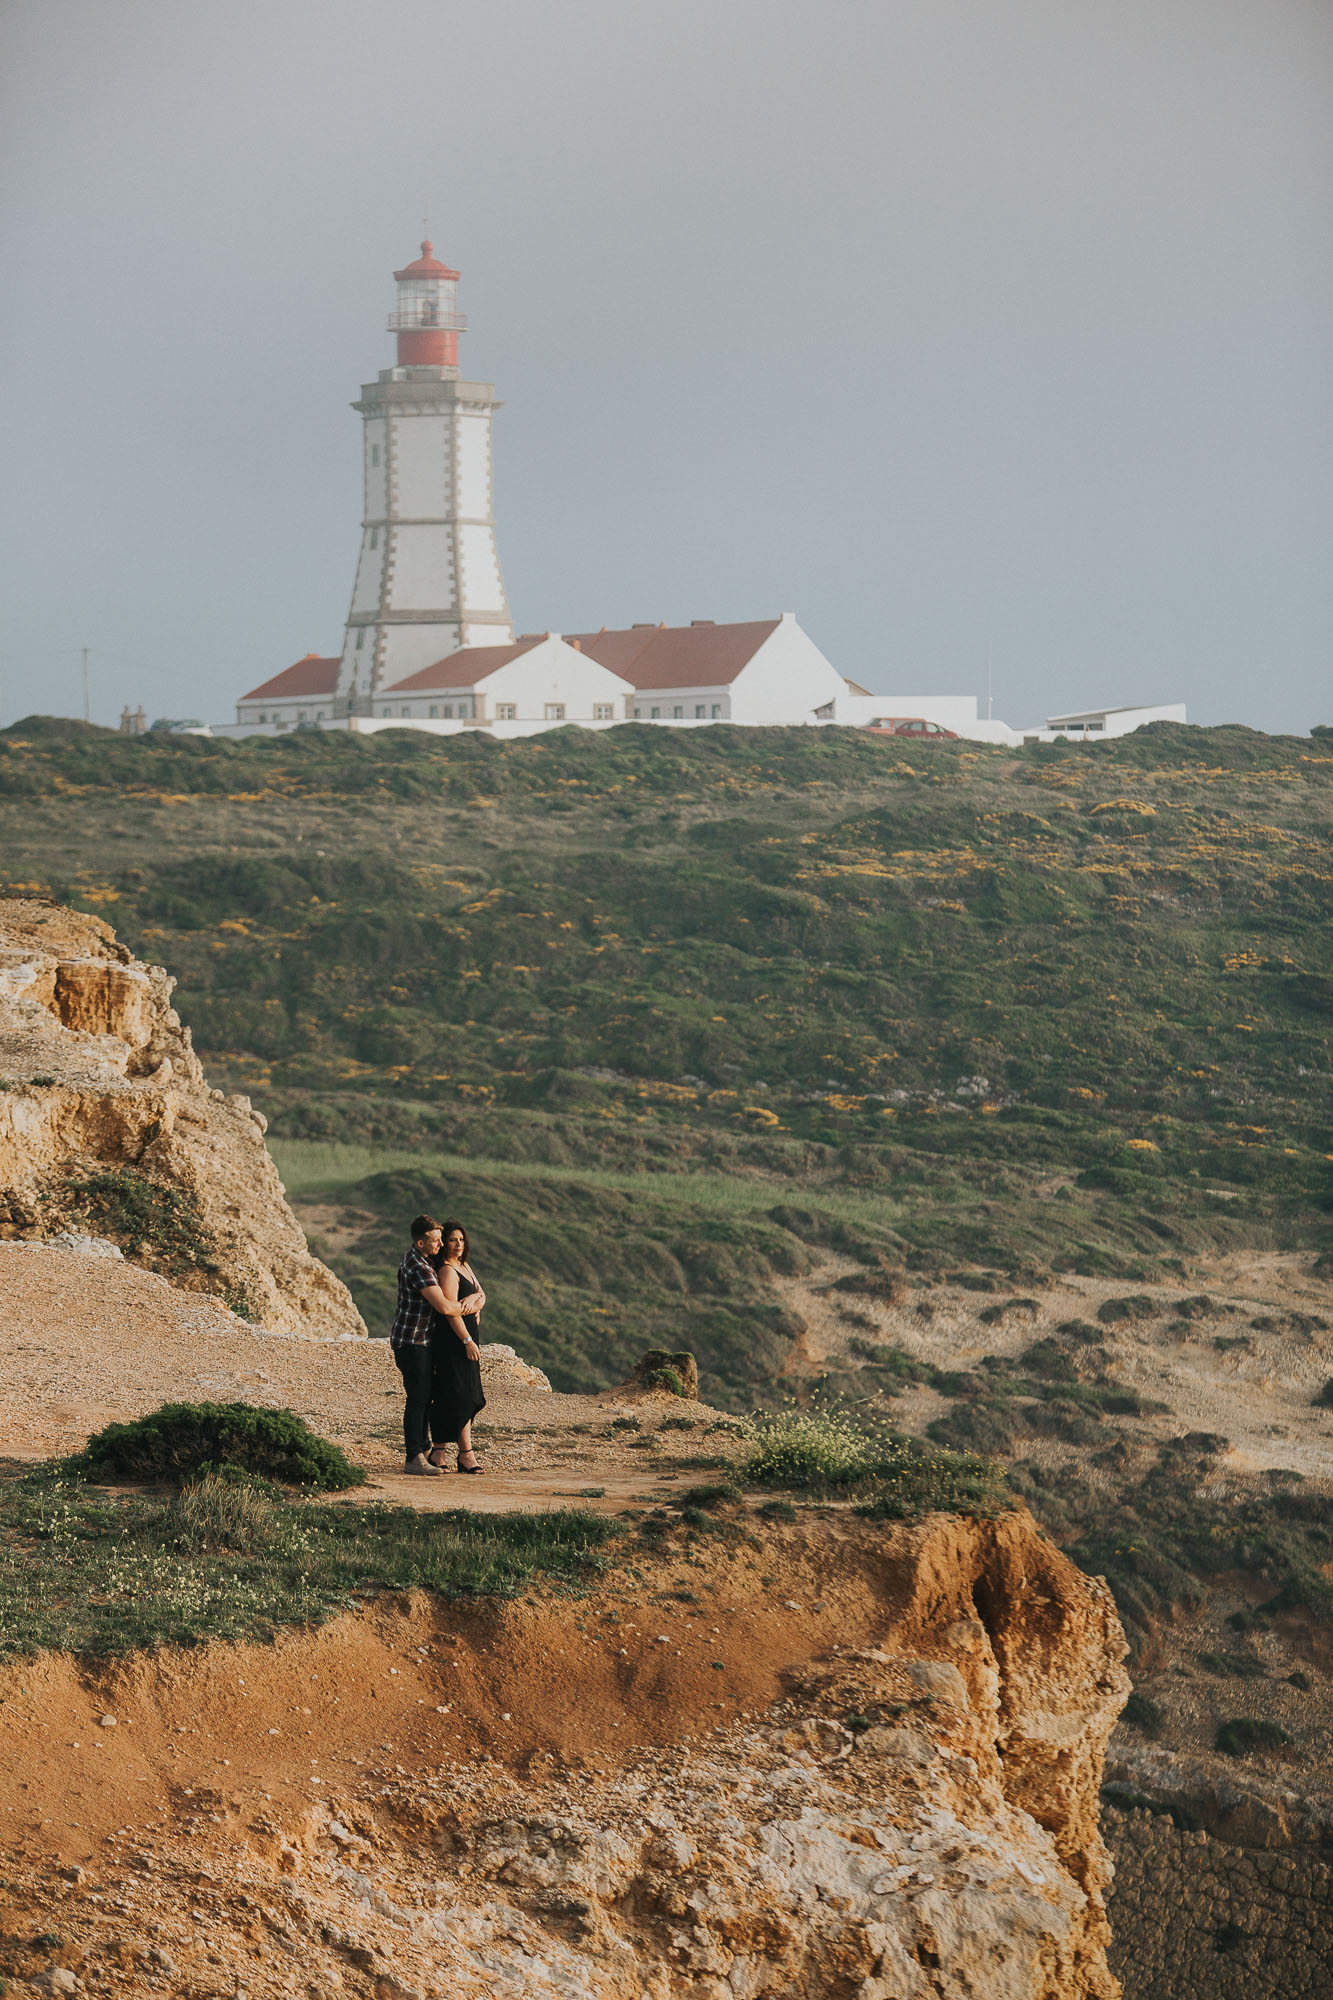 12 Beatriz-Ben-engagement-love-session-Filipe-Santiago-Fotografia-Ericeira-Lisboa-Mafra-Malveira-Sesimbra-Cabo-Espichel-Praia-Farol-Natural-Fotografo-Reportagem-lifestyle